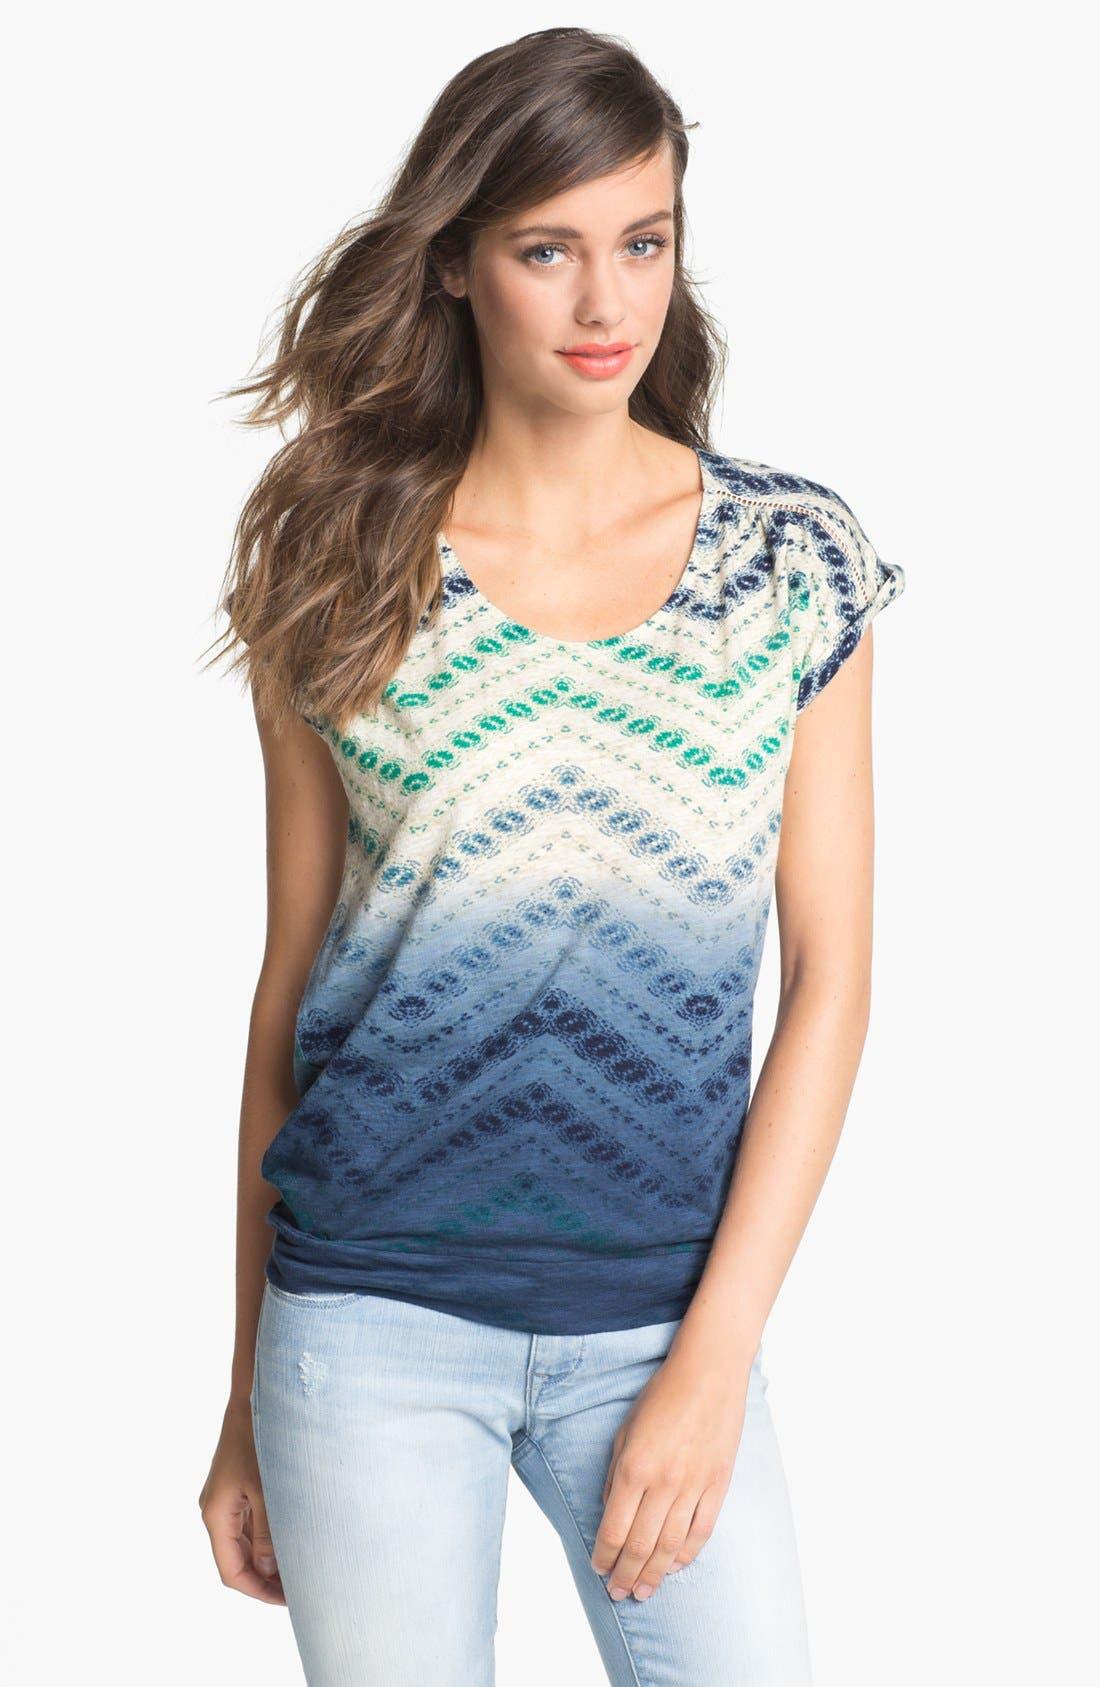 Alternate Image 1 Selected - Lucky Brand 'Cobra Basket' Ombré Print Top (Plus Size)